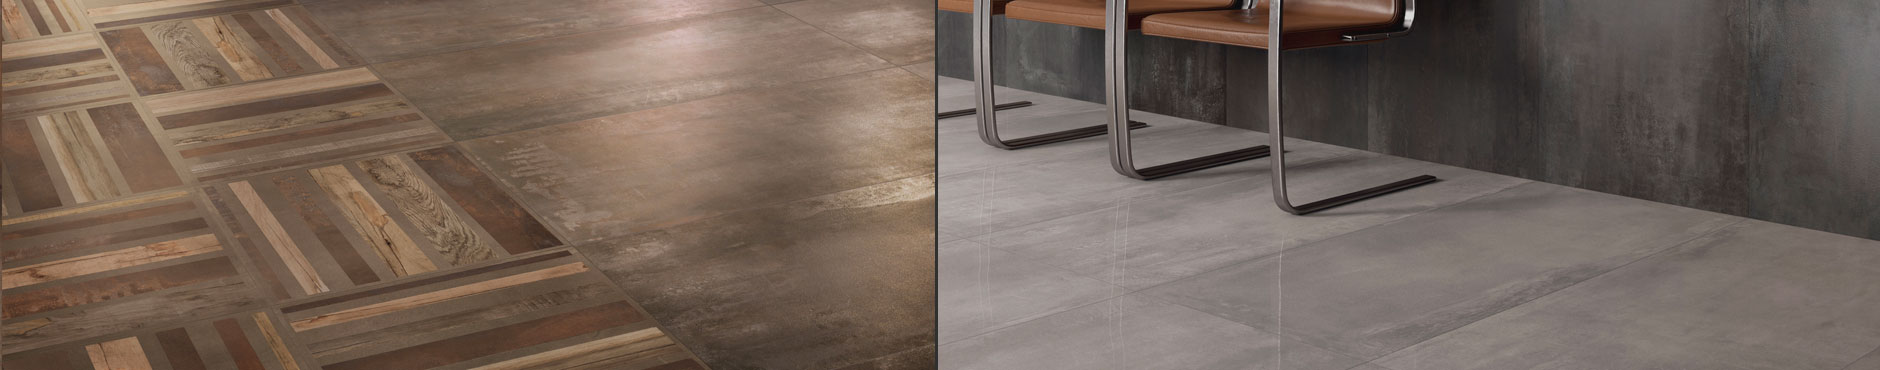 ABK Interno 9 metallic effect tiles